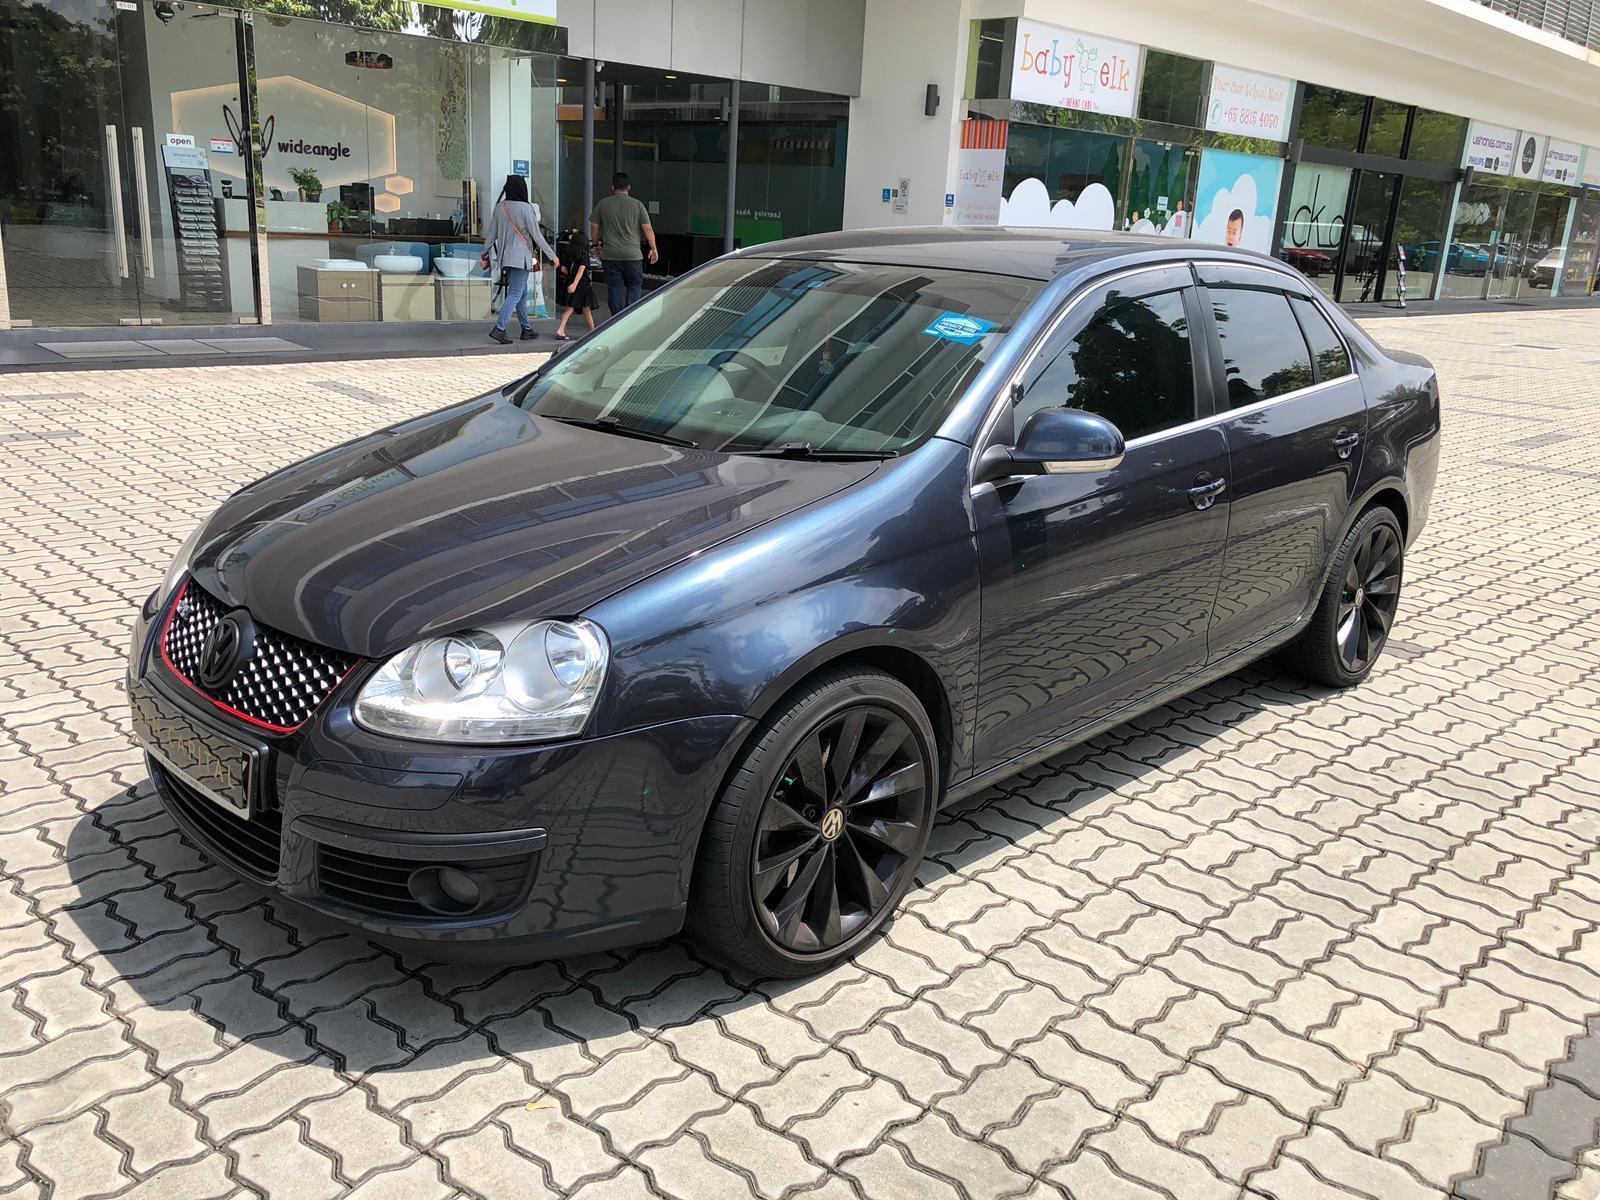 Volkswagen Jetta 1.4A - Cheapest rental in city, quickest assistance!